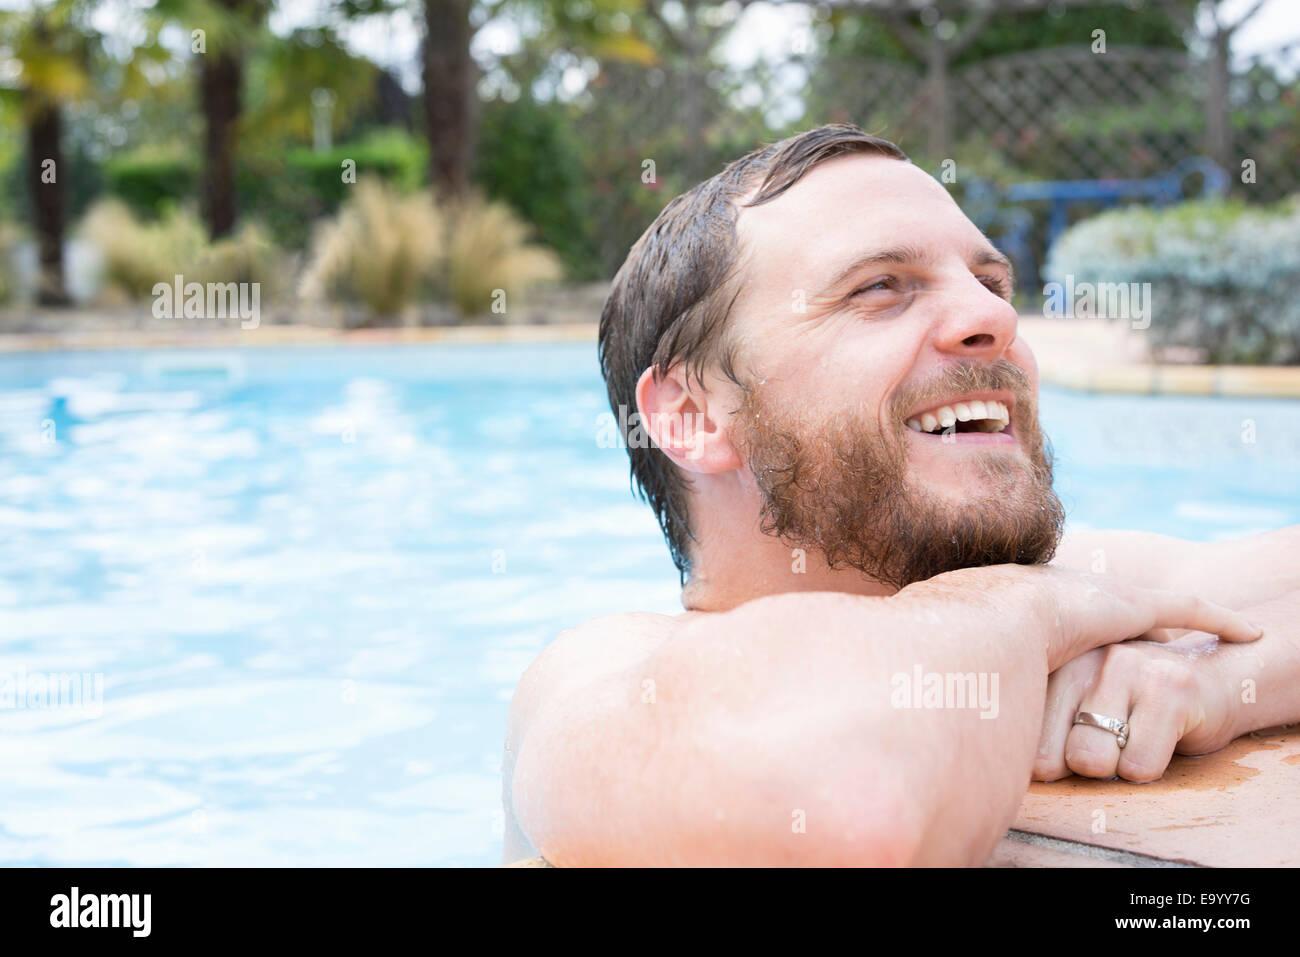 El hombre inclinado sobre el borde de la piscina Foto de stock